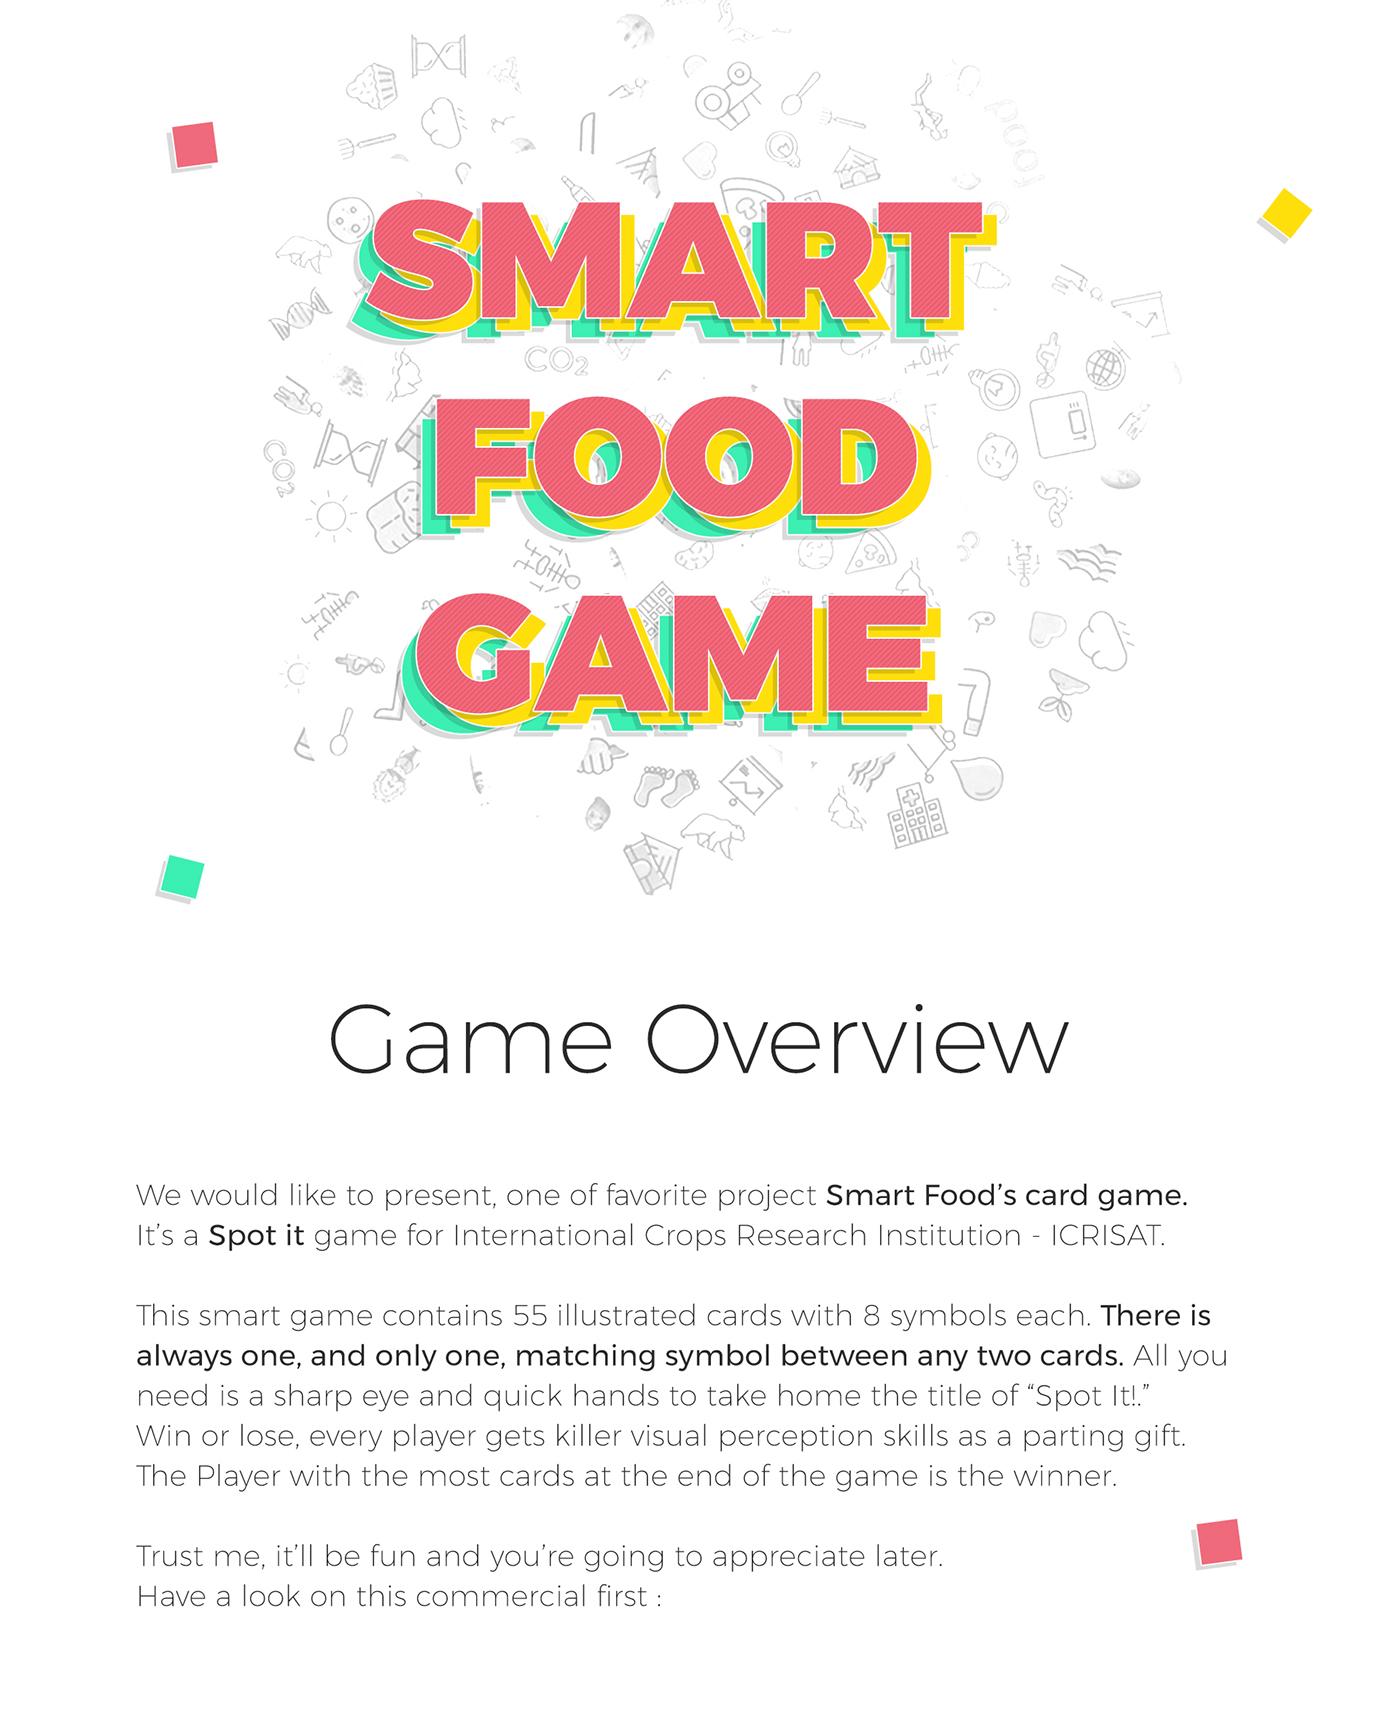 smart food cards game whatastory top branding videos